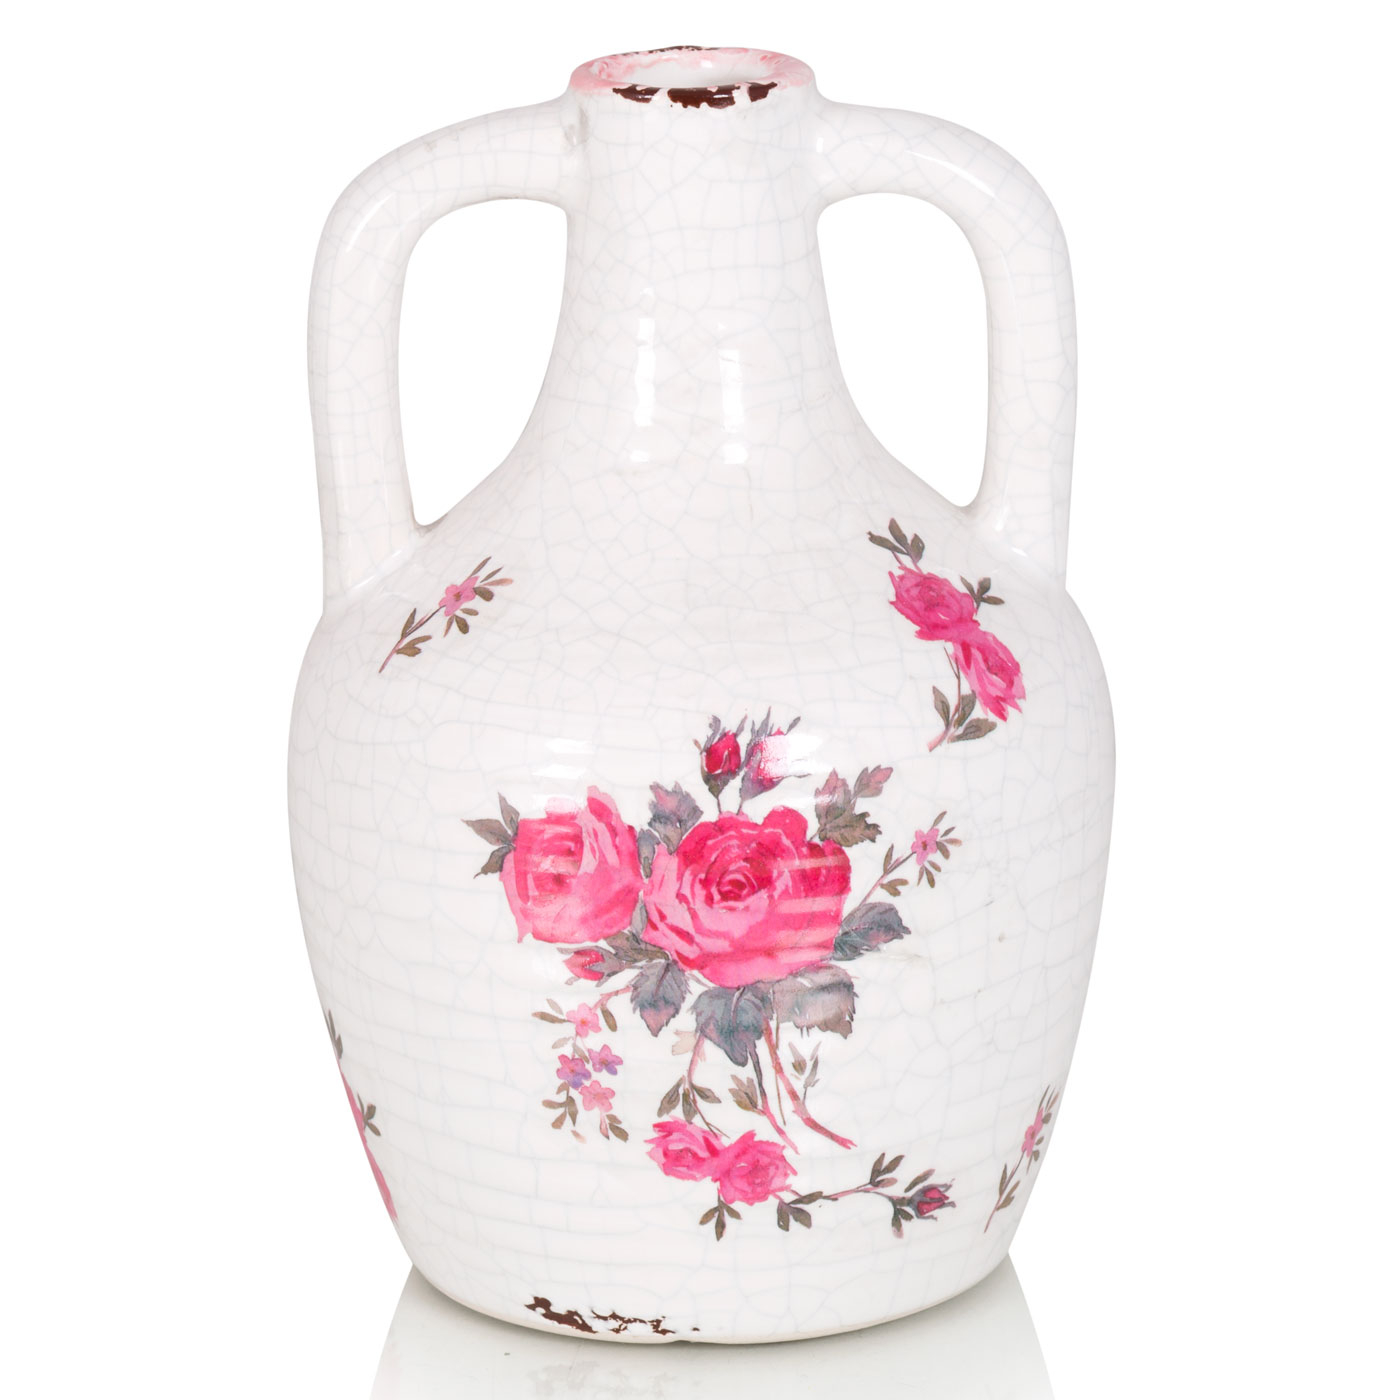 {} Home Philosophy Ваза-кувшин Susan Цвет: Бело-Розовый (11х18 см) ваза керамика розовый рассвет 18 12 8 5 см 863622